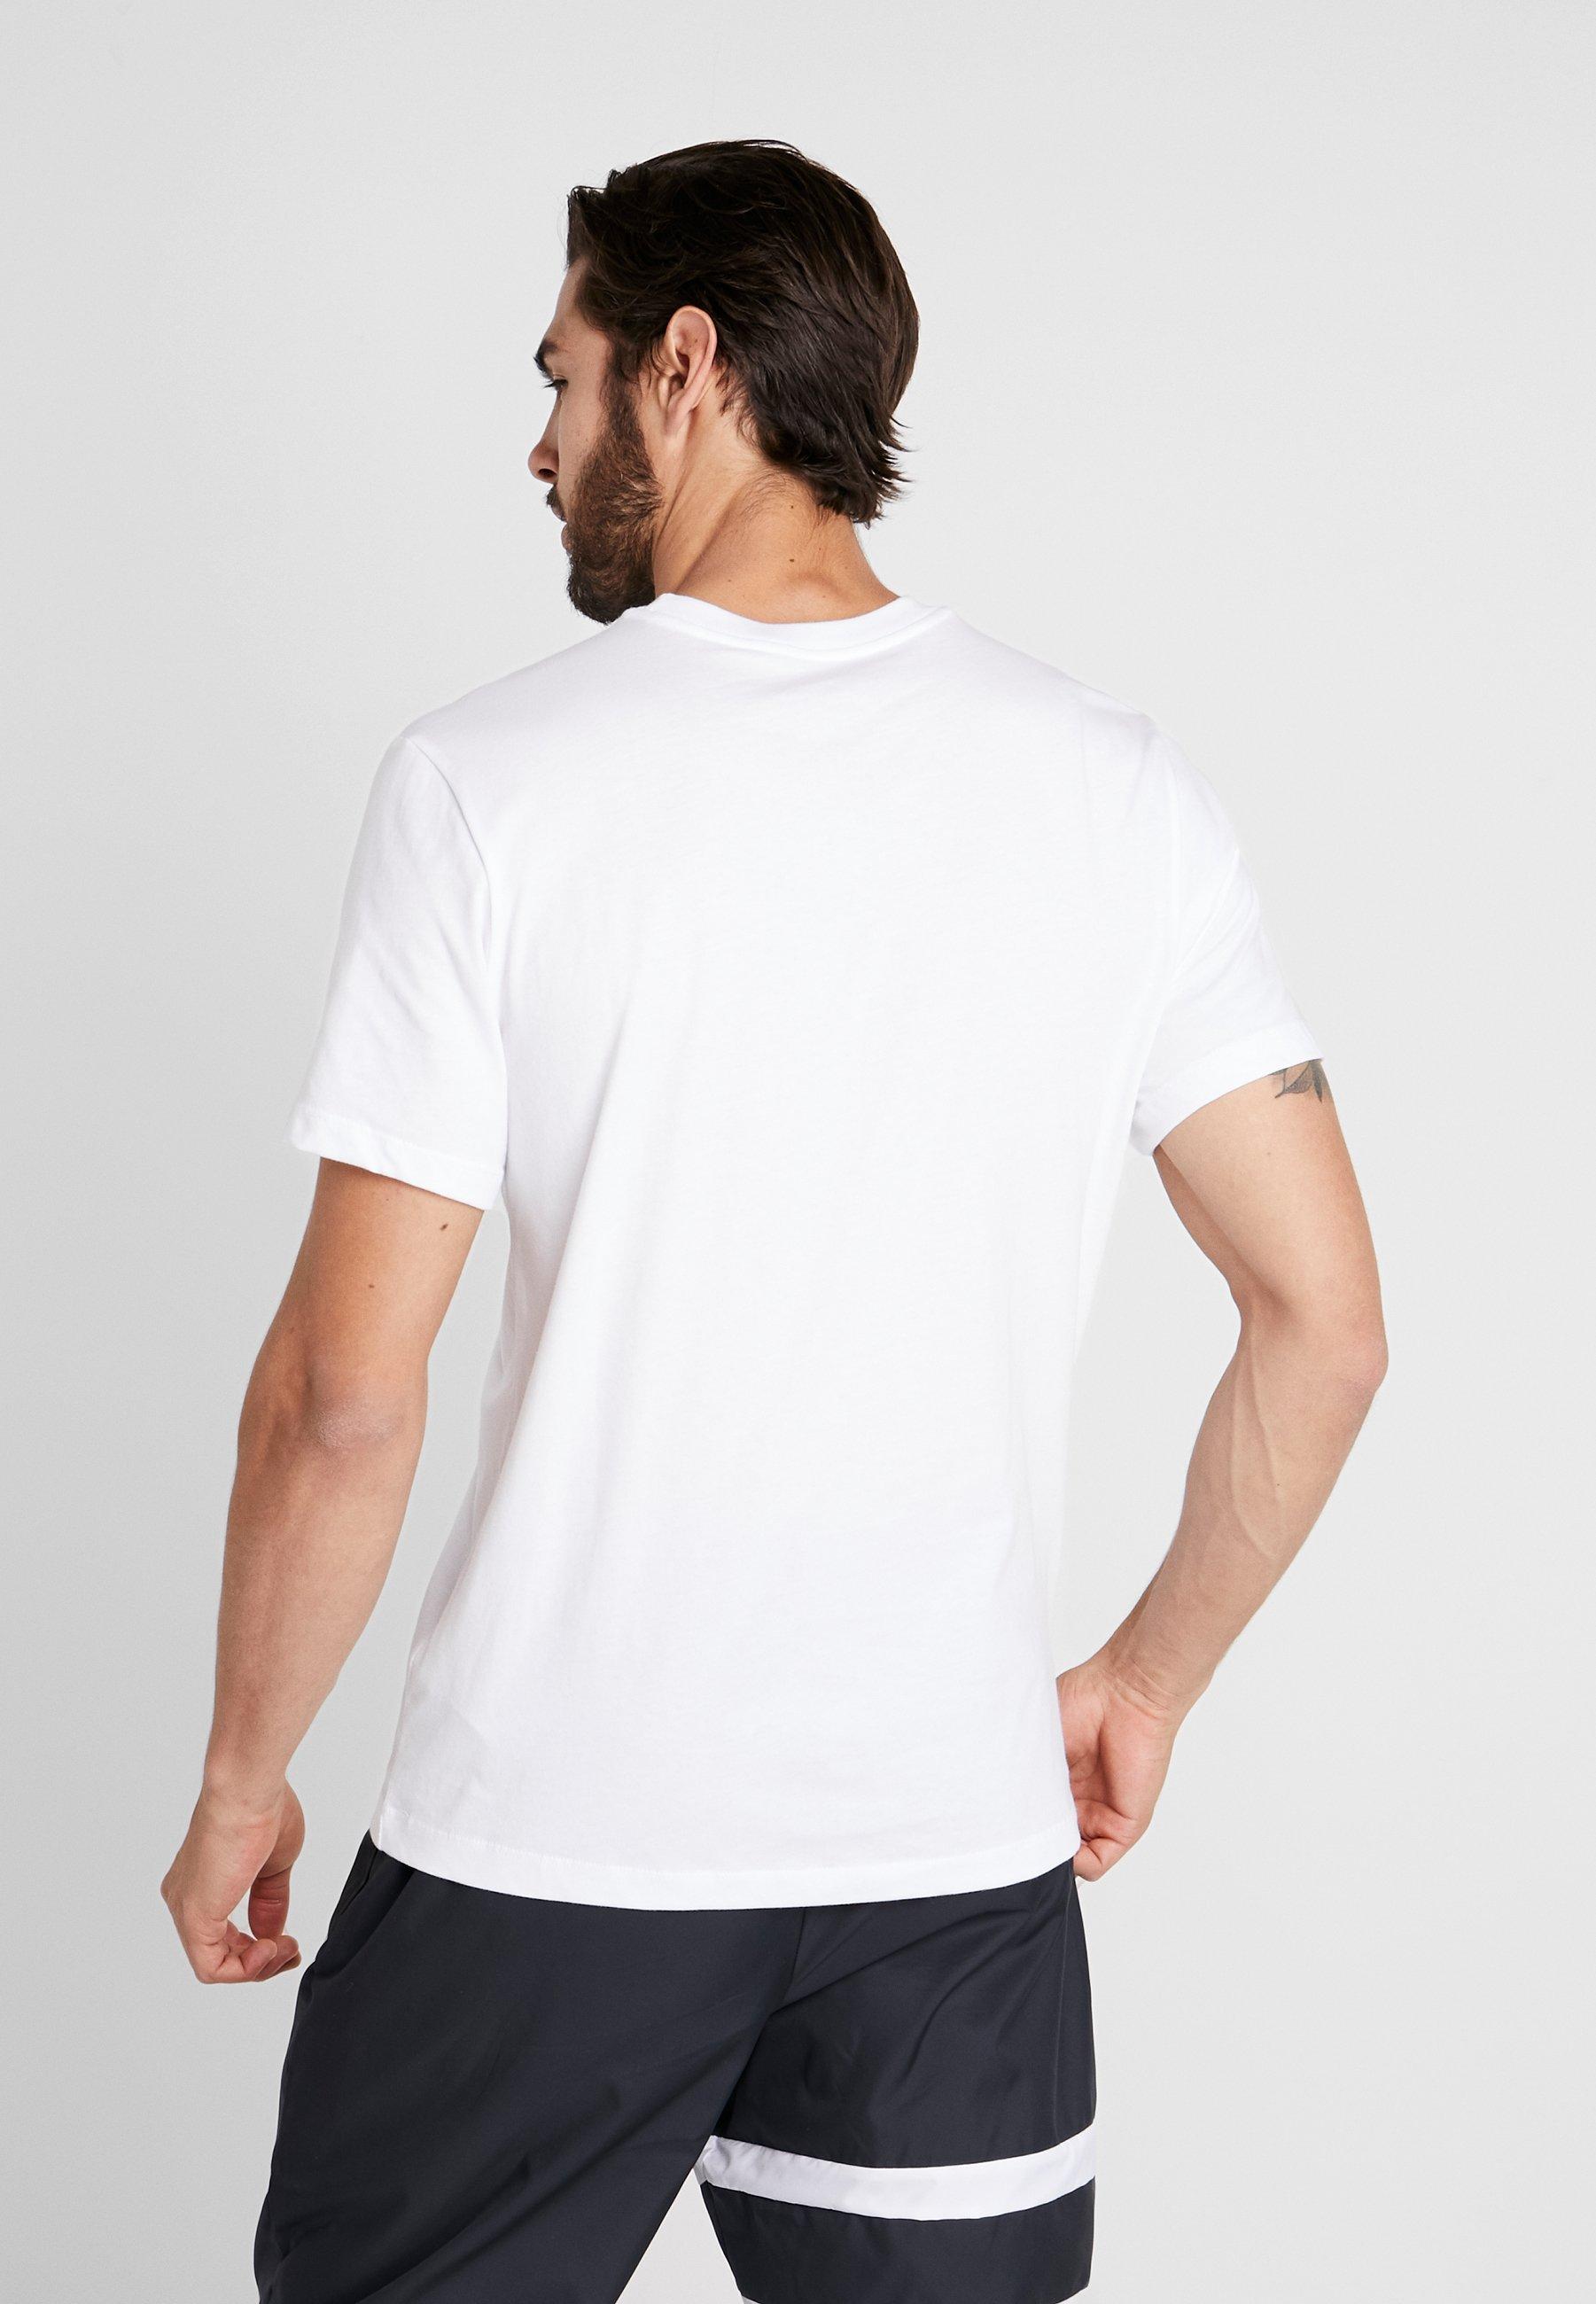 Tee De Nike Rom Supporter Performance CrestArticle As Evergreen White 3AR54jL